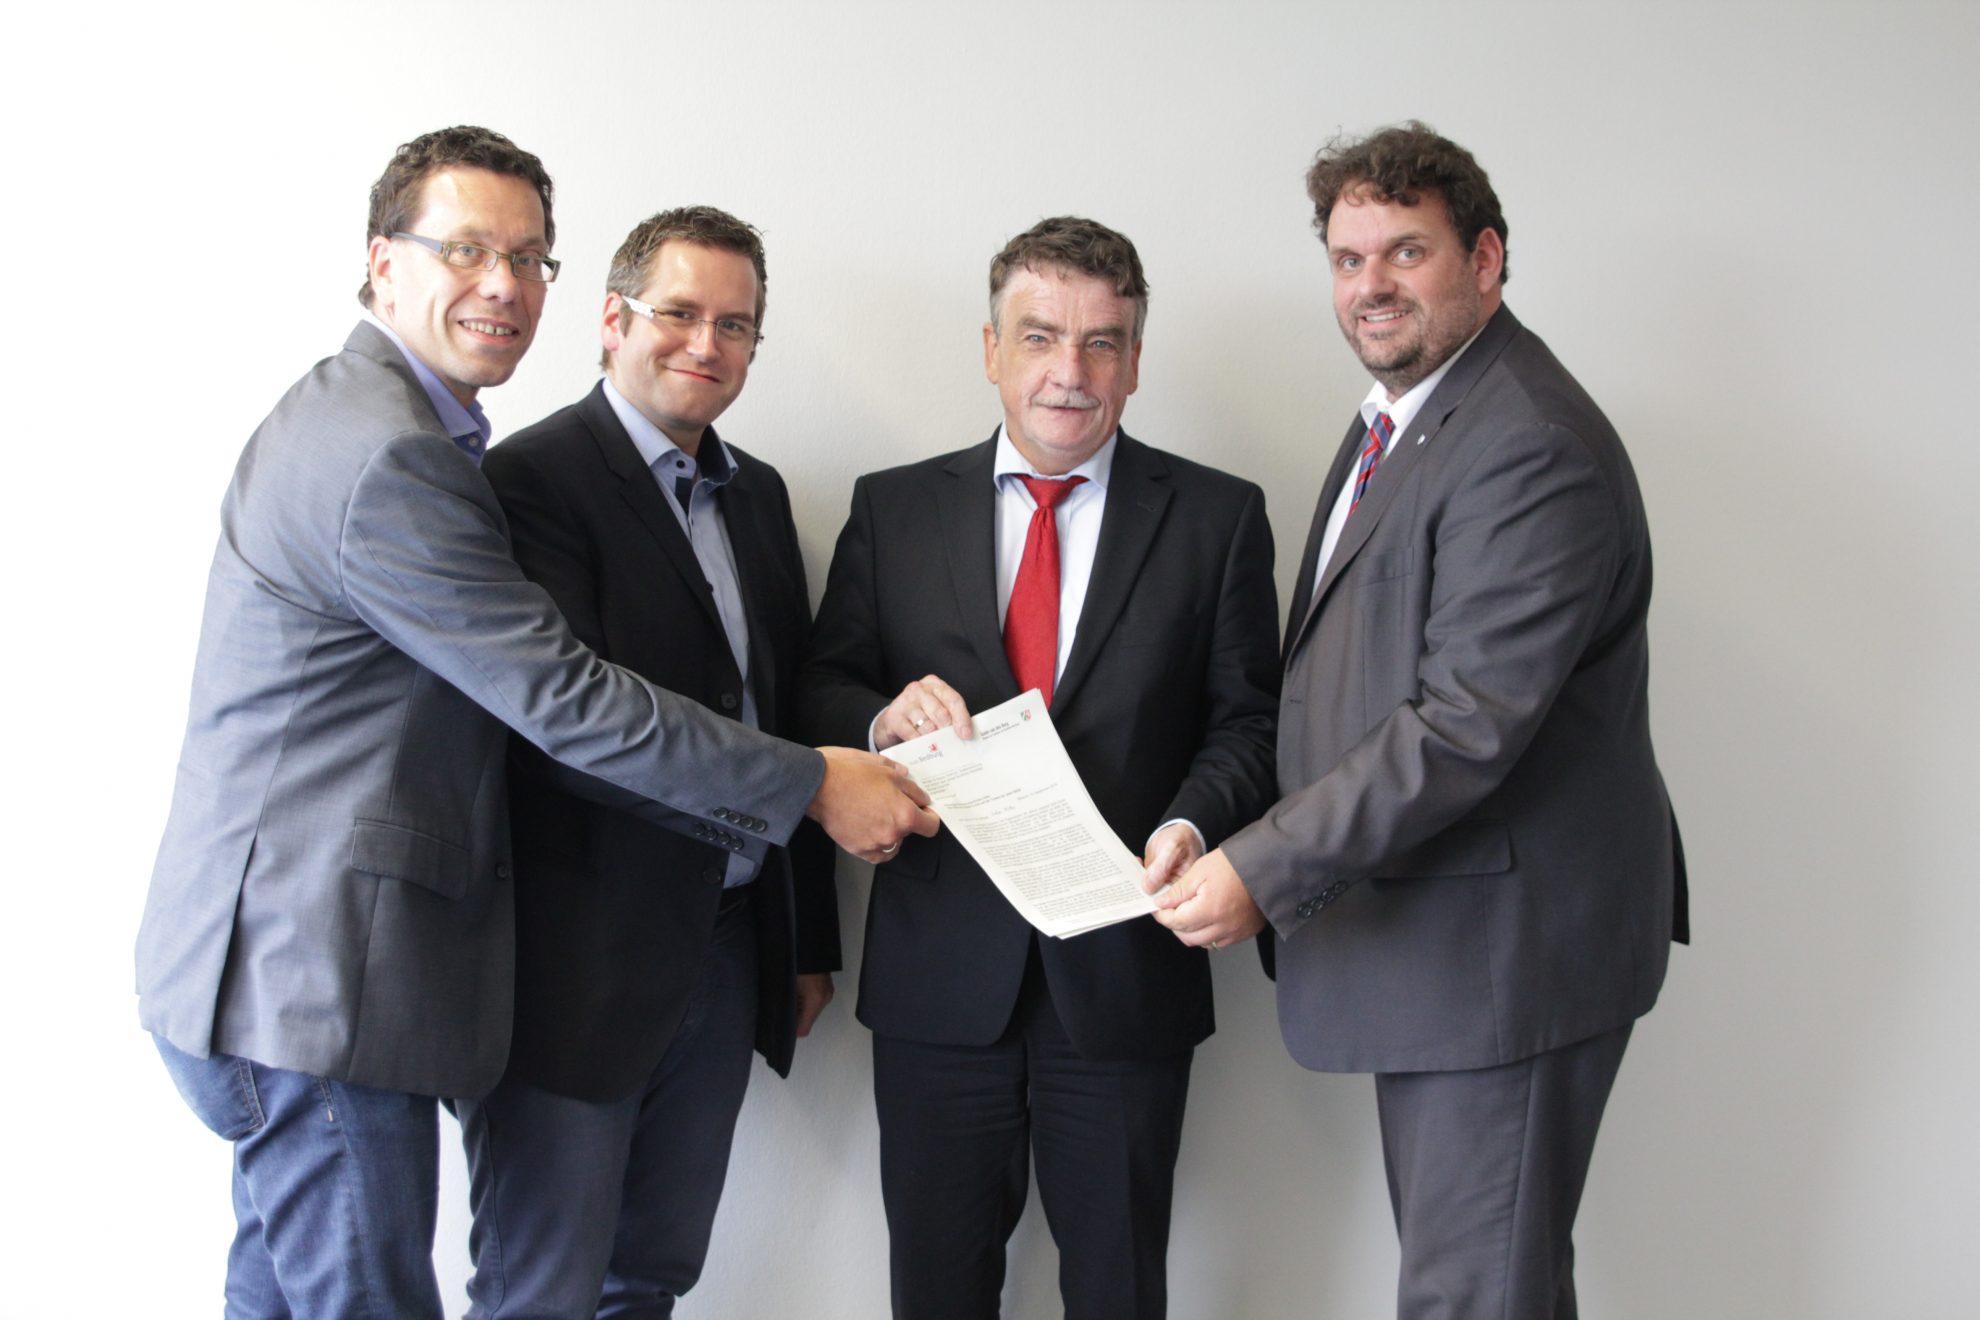 Dierk Timm, Sascha Solbach, Michel Groschek, Guido van den Berg (10.9.2014)